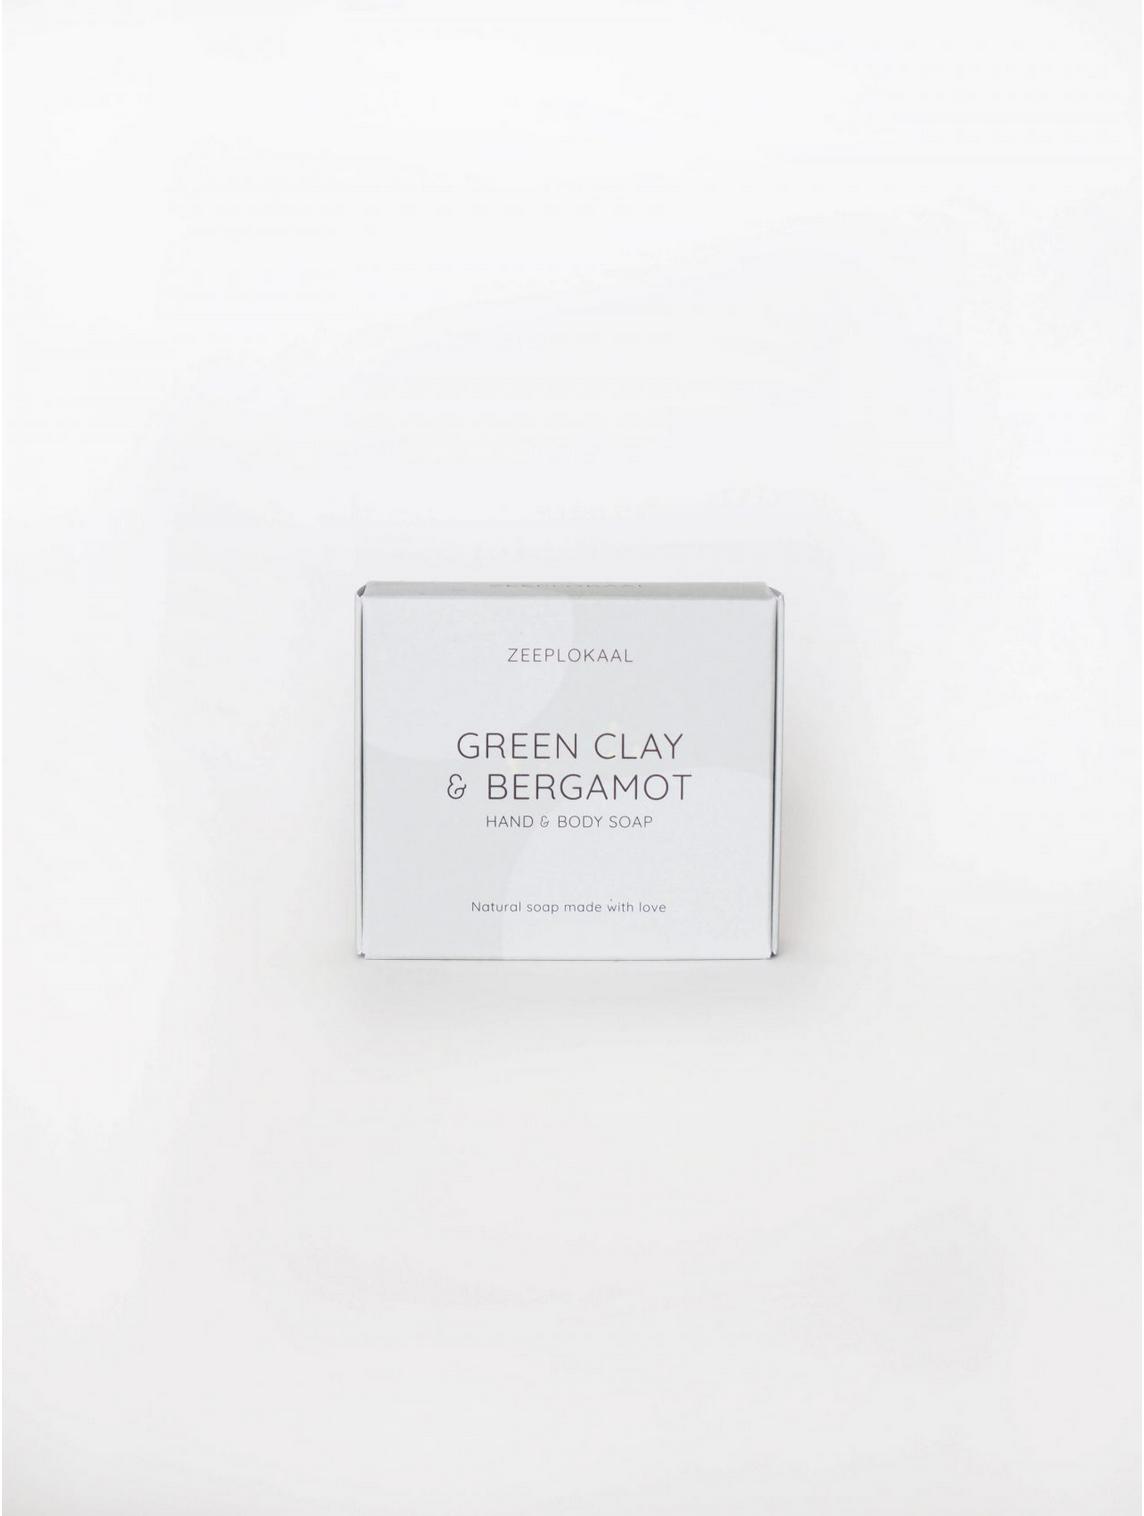 Hand- en lichaamszeep Groene Klei & Bergamot - Zeeplokaal-2